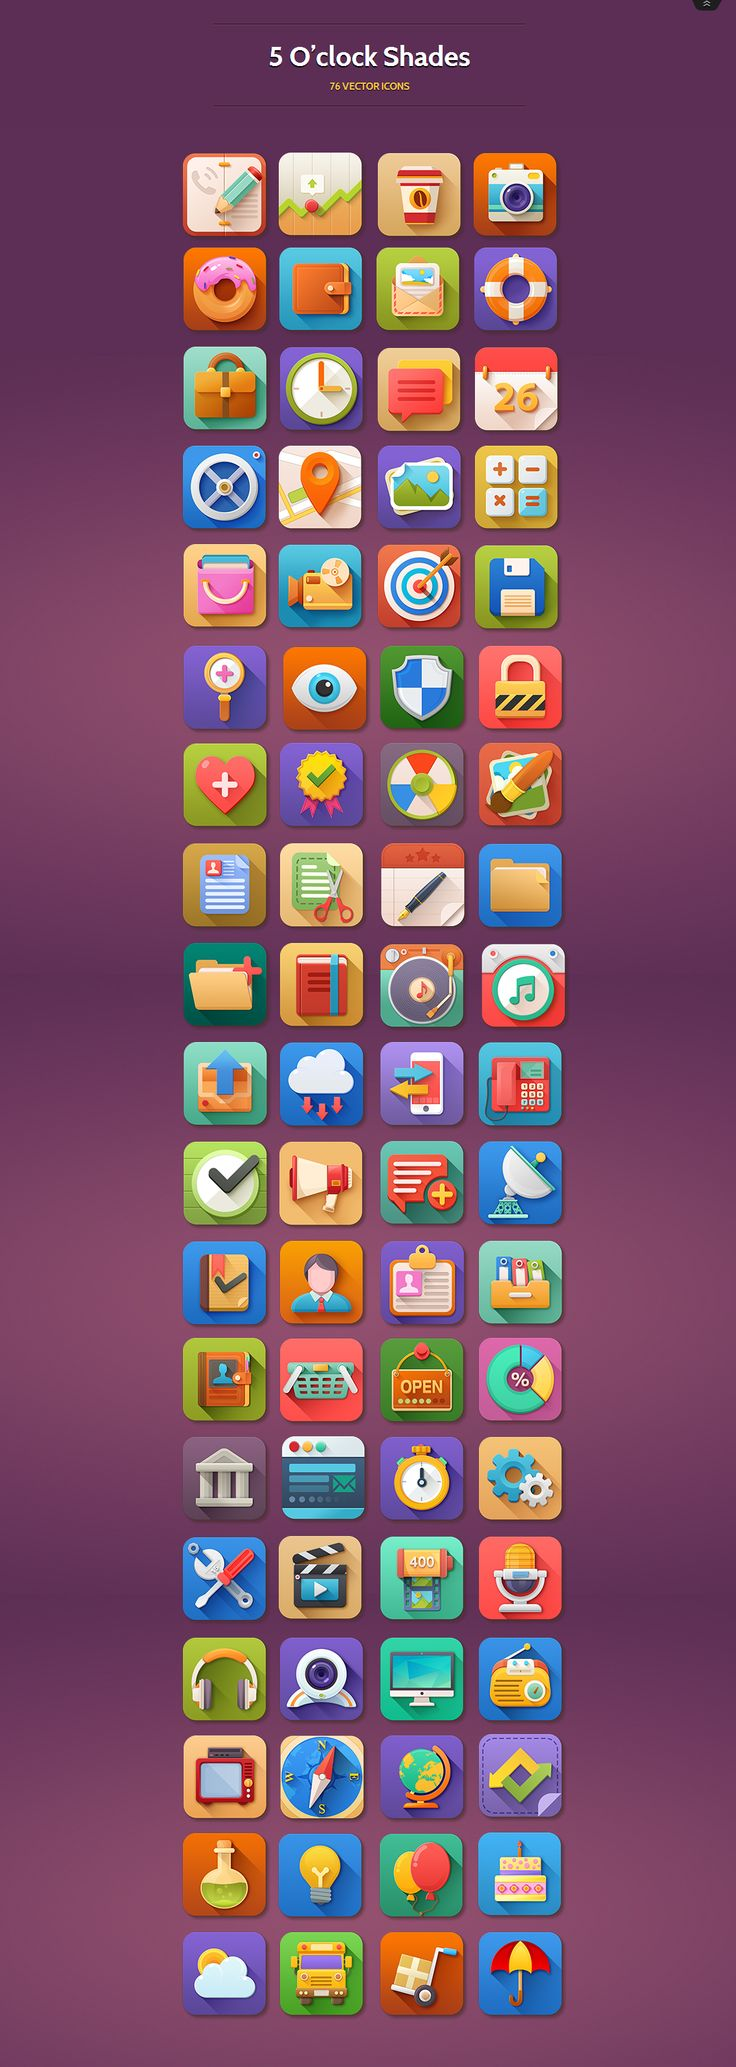 5 O'clock Shades Icon Set http://pixelkit.com/amember/aff/go?r=27299&i=22 #web #design #icons